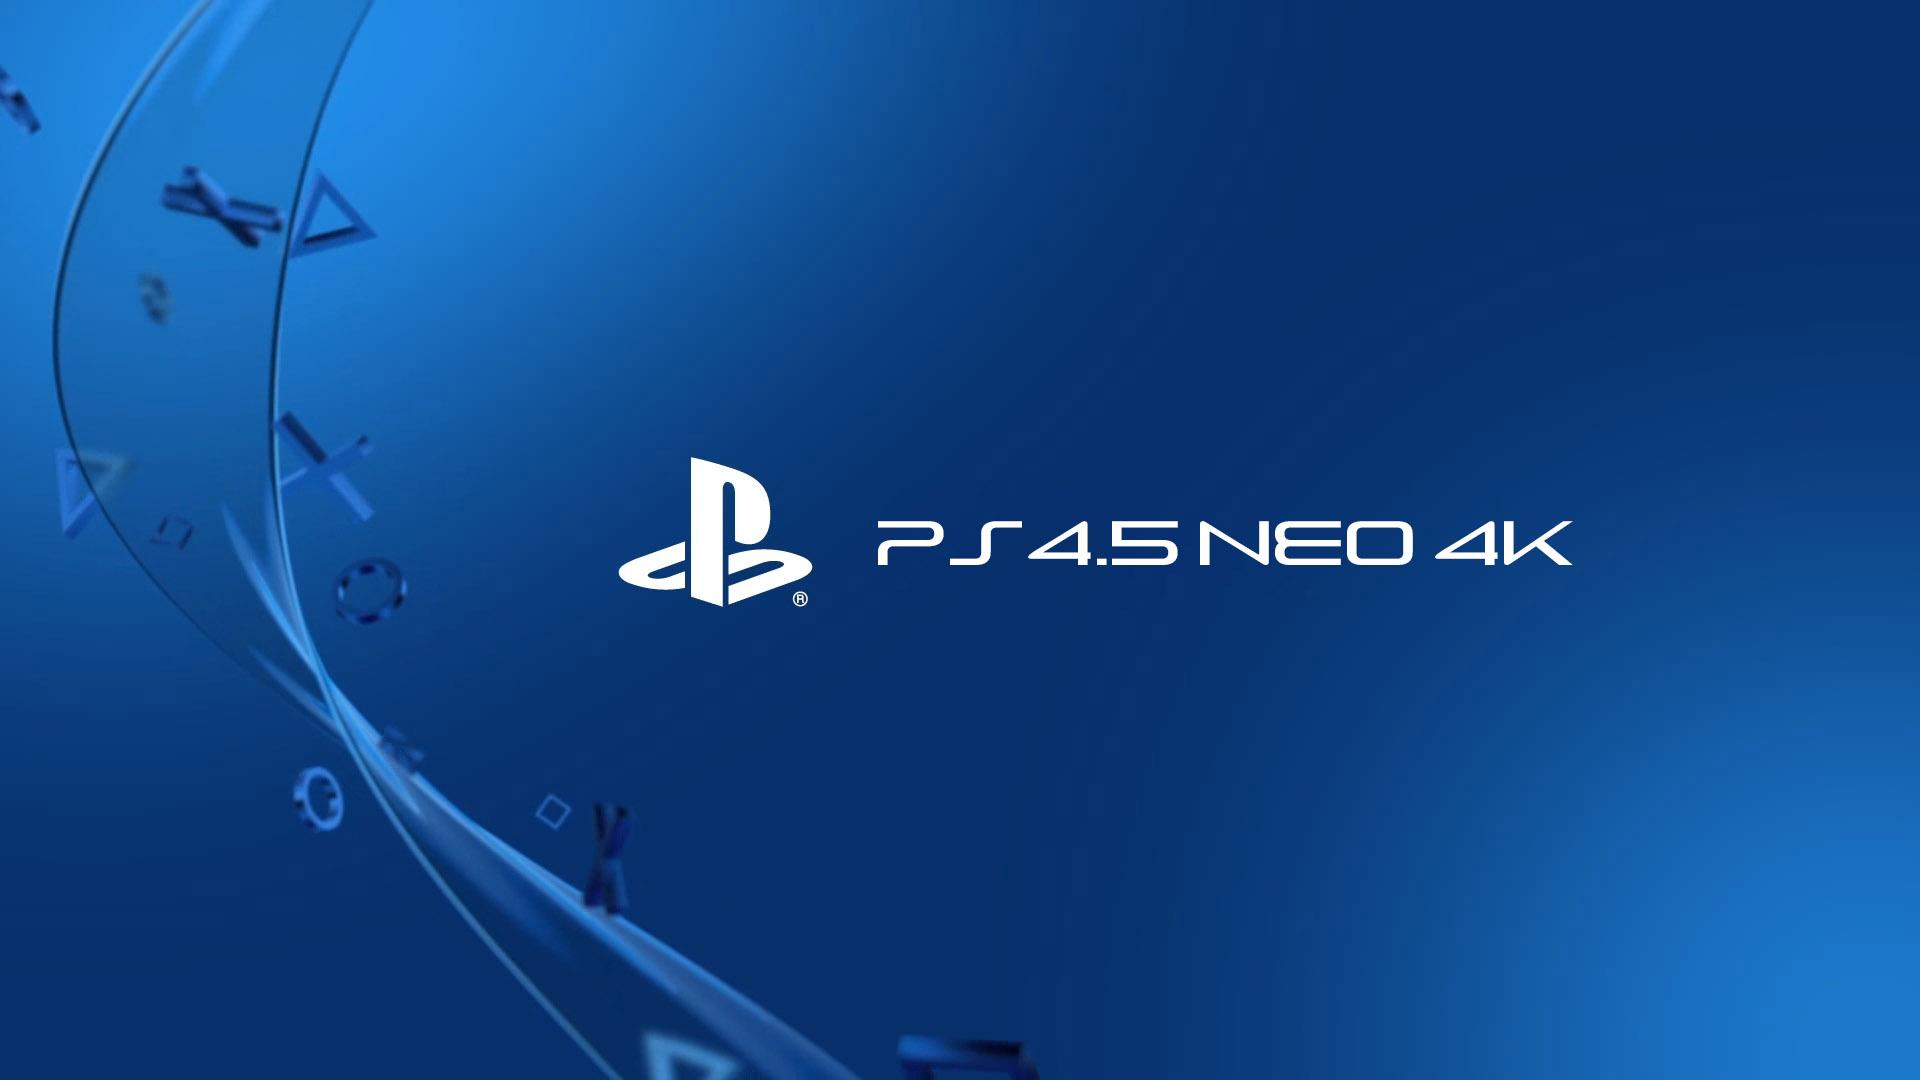 ps4-neo-4k